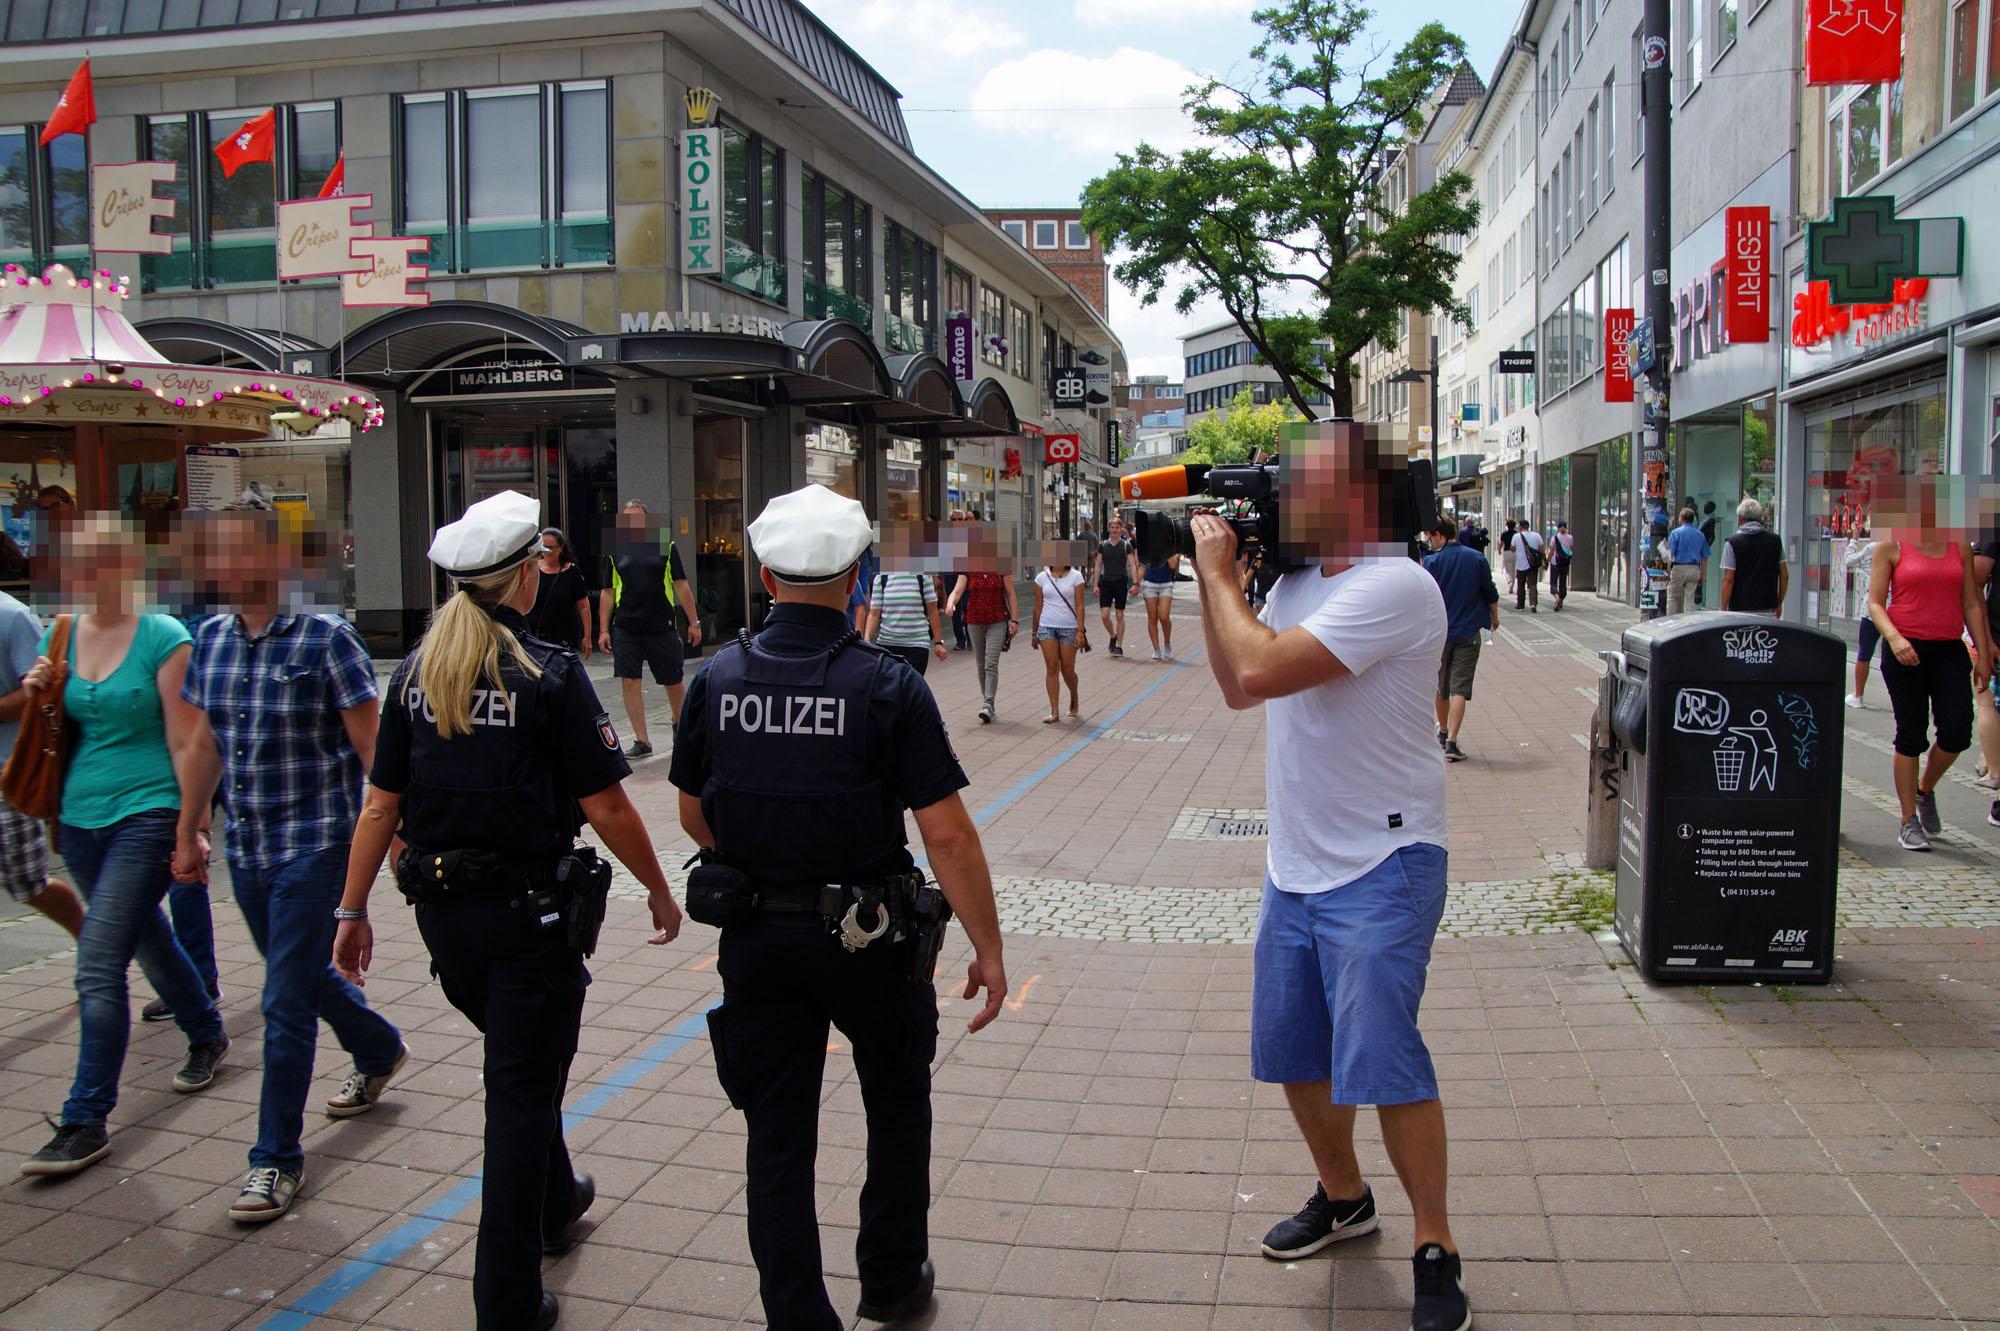 Polizei Kiel Aktuell